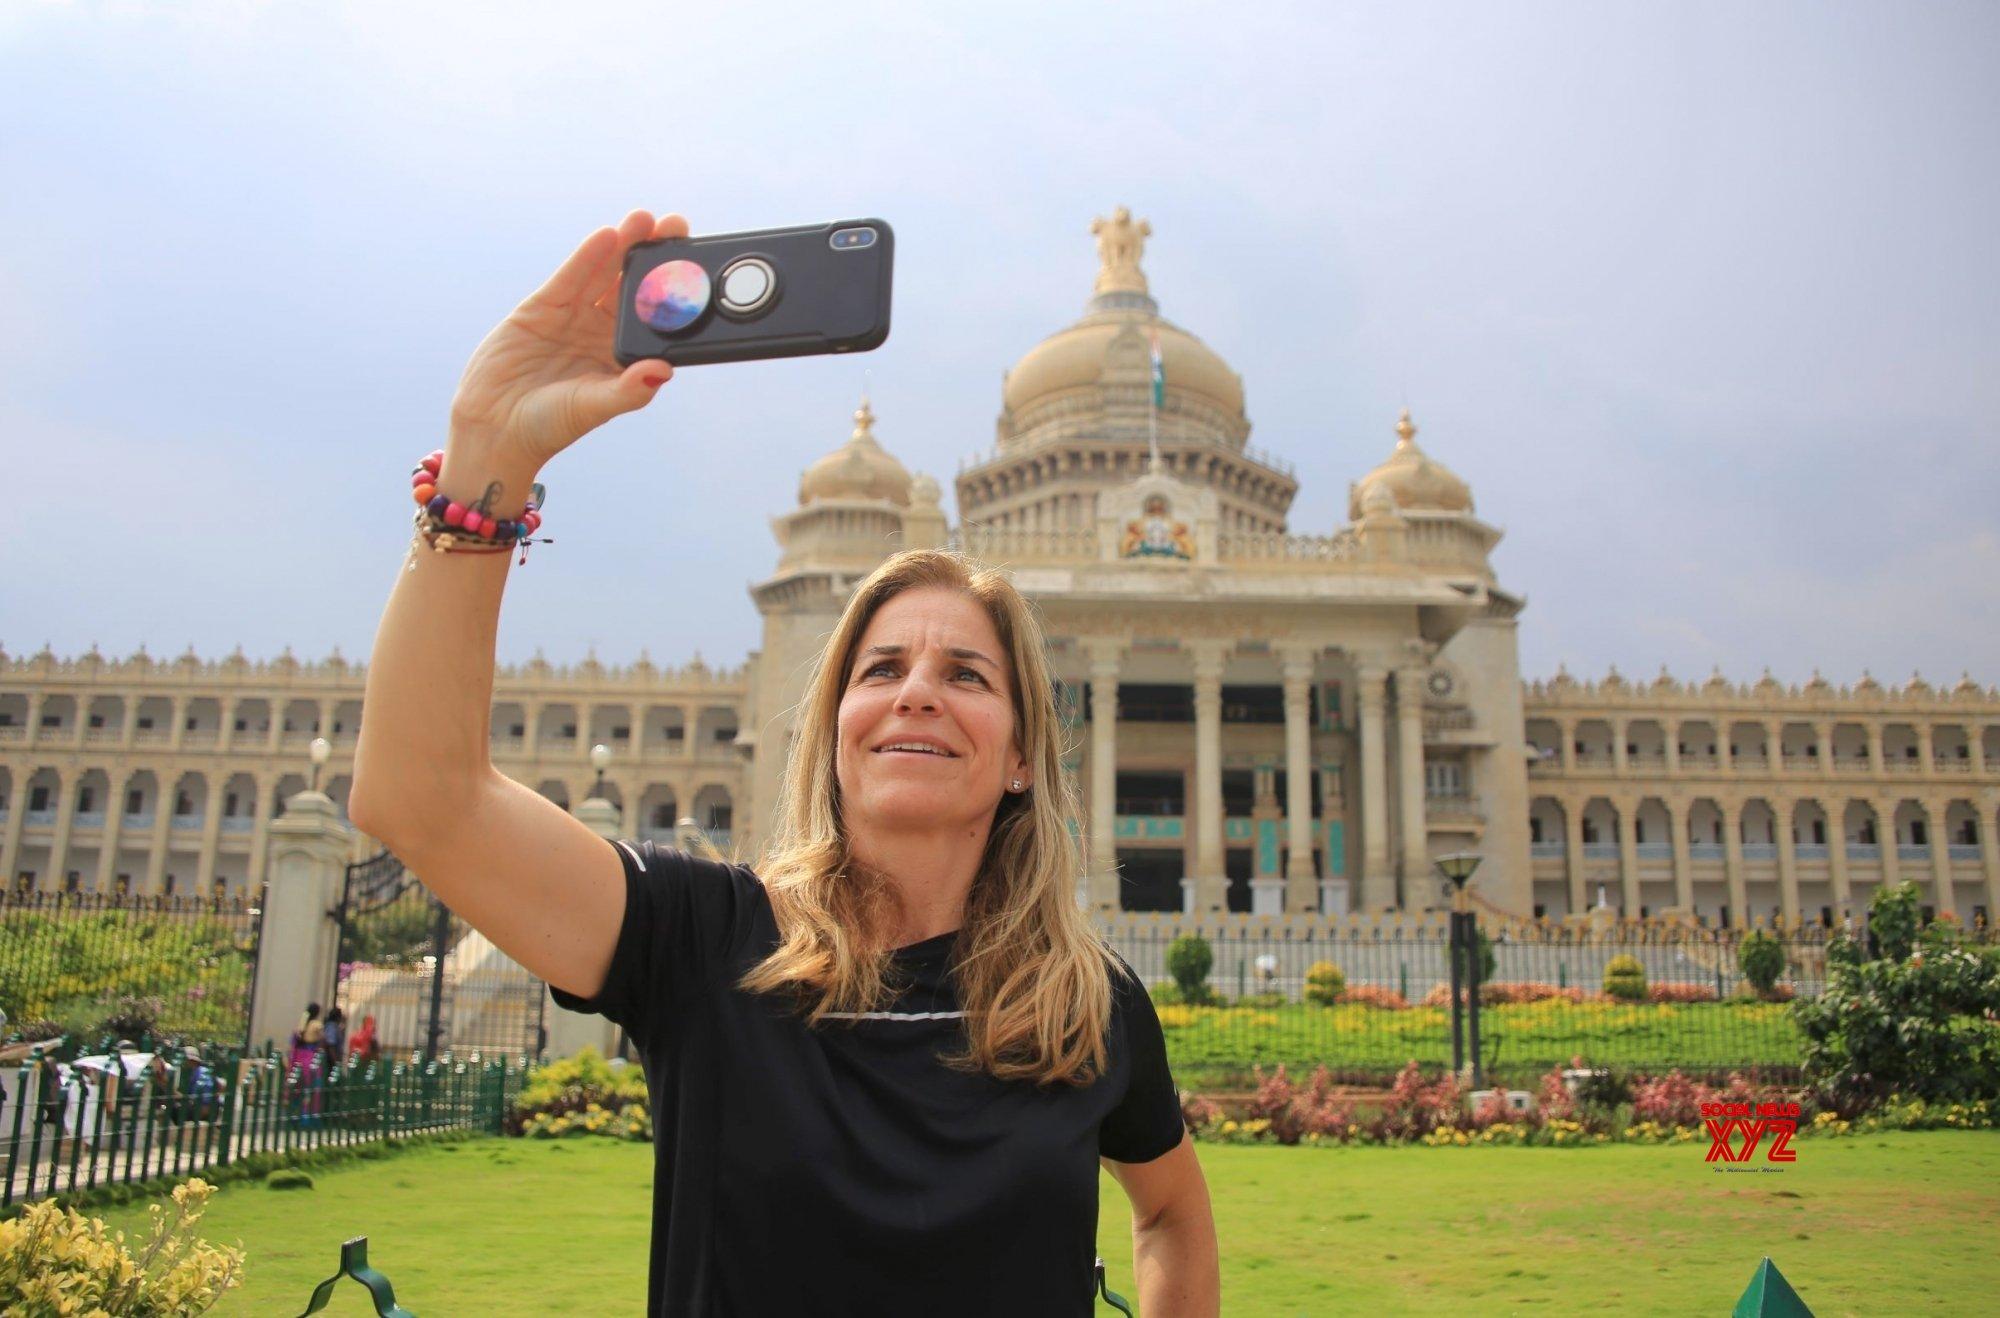 Bengaluru: Arantxa Sanchez Vicario at Vidhana Soudha #Gallery